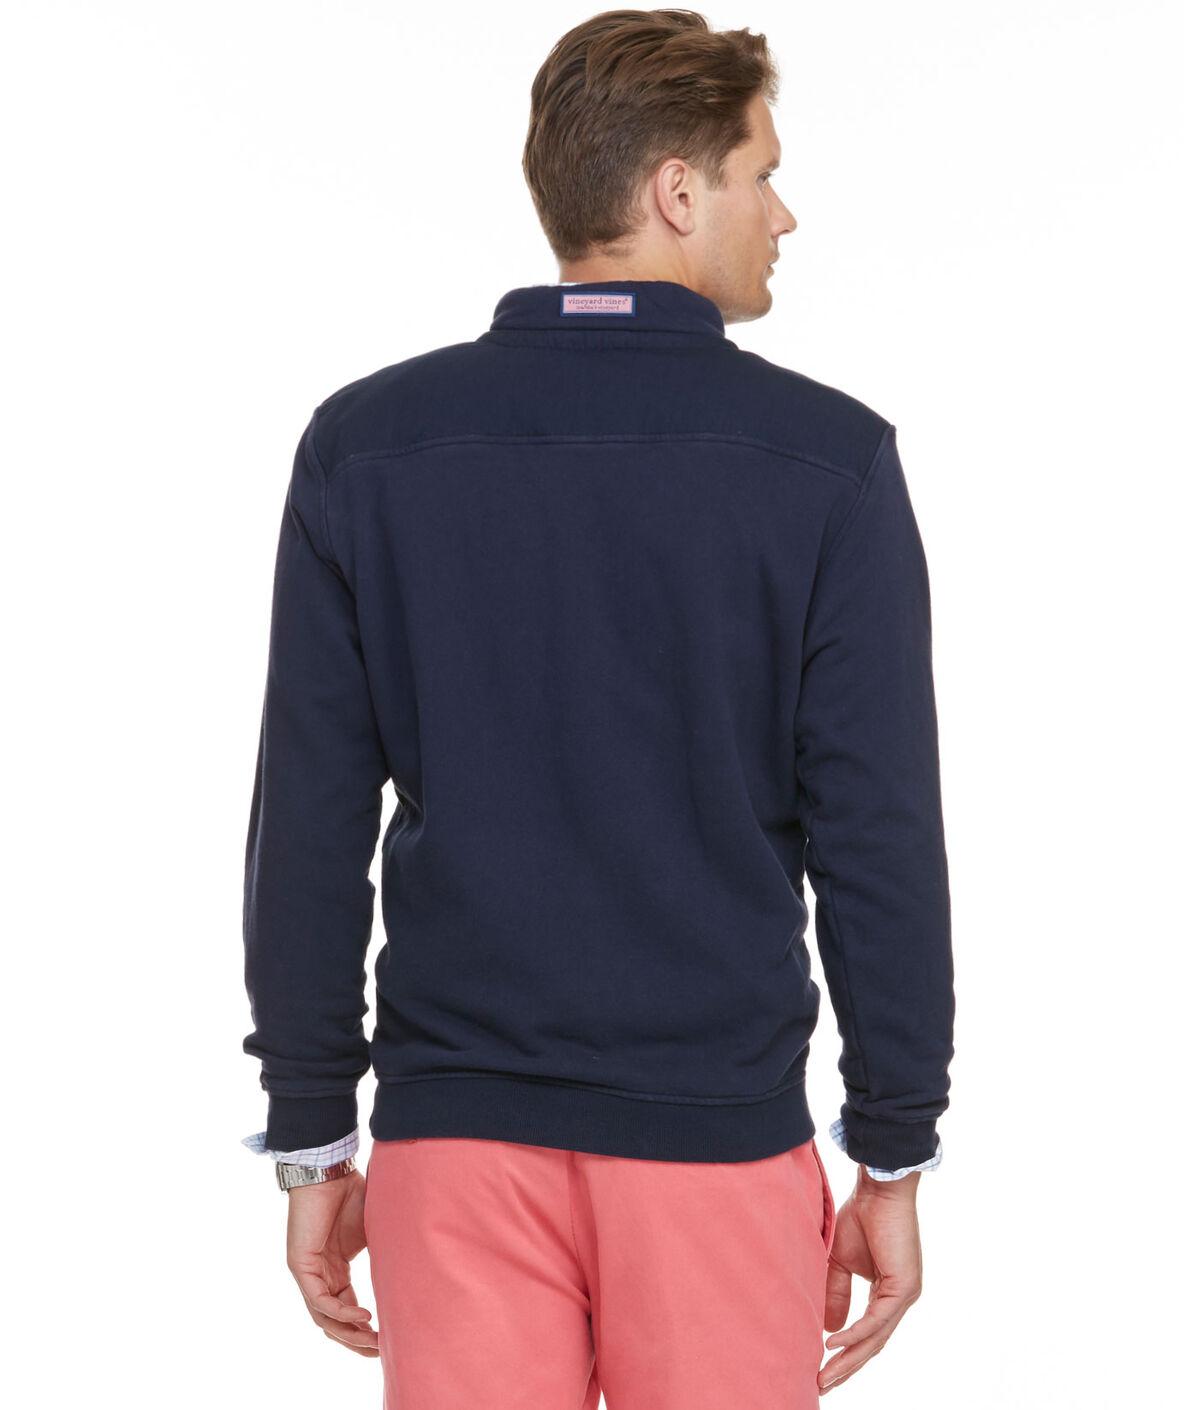 Men 39 S Pullovers Shep Shirt 1 4 Zip Pullovers For Men